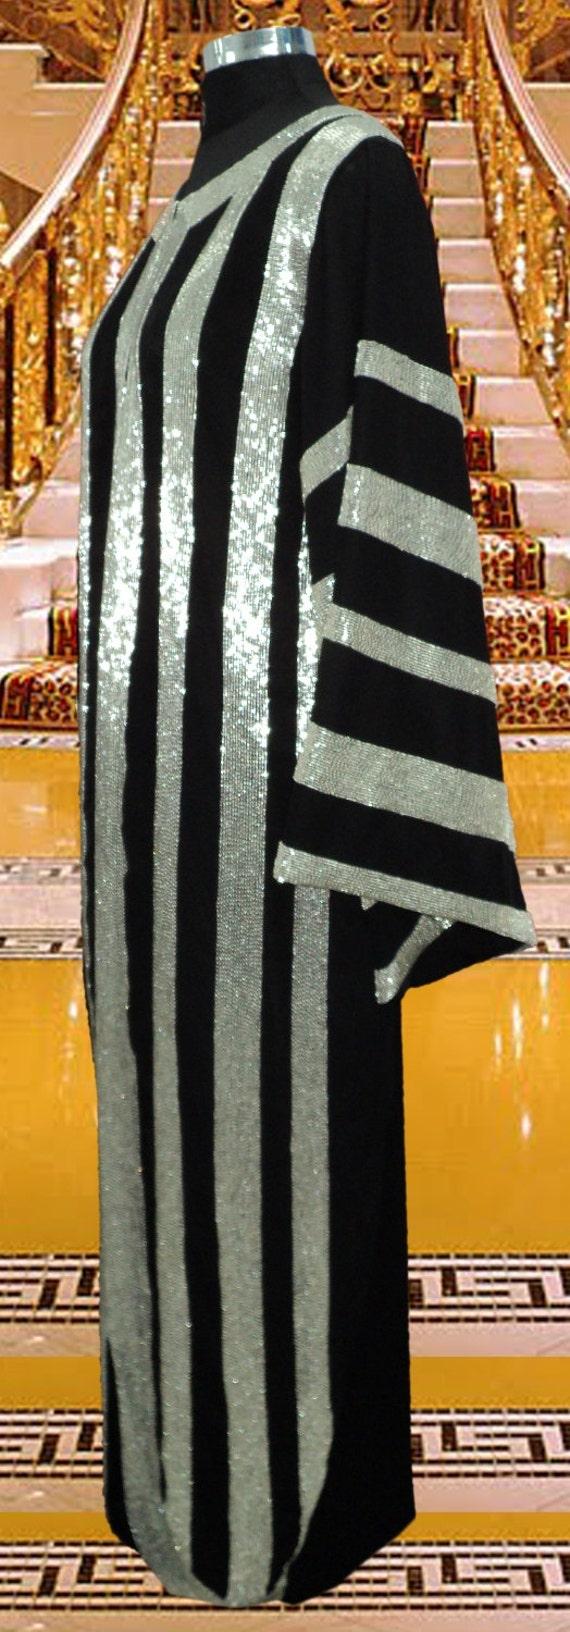 Plus size Party dress Kaftan Plus Abaya clothing size dress dress clothing dress Dubai Caftan Dress Elegant Maxi African kaftan wvfqYPR